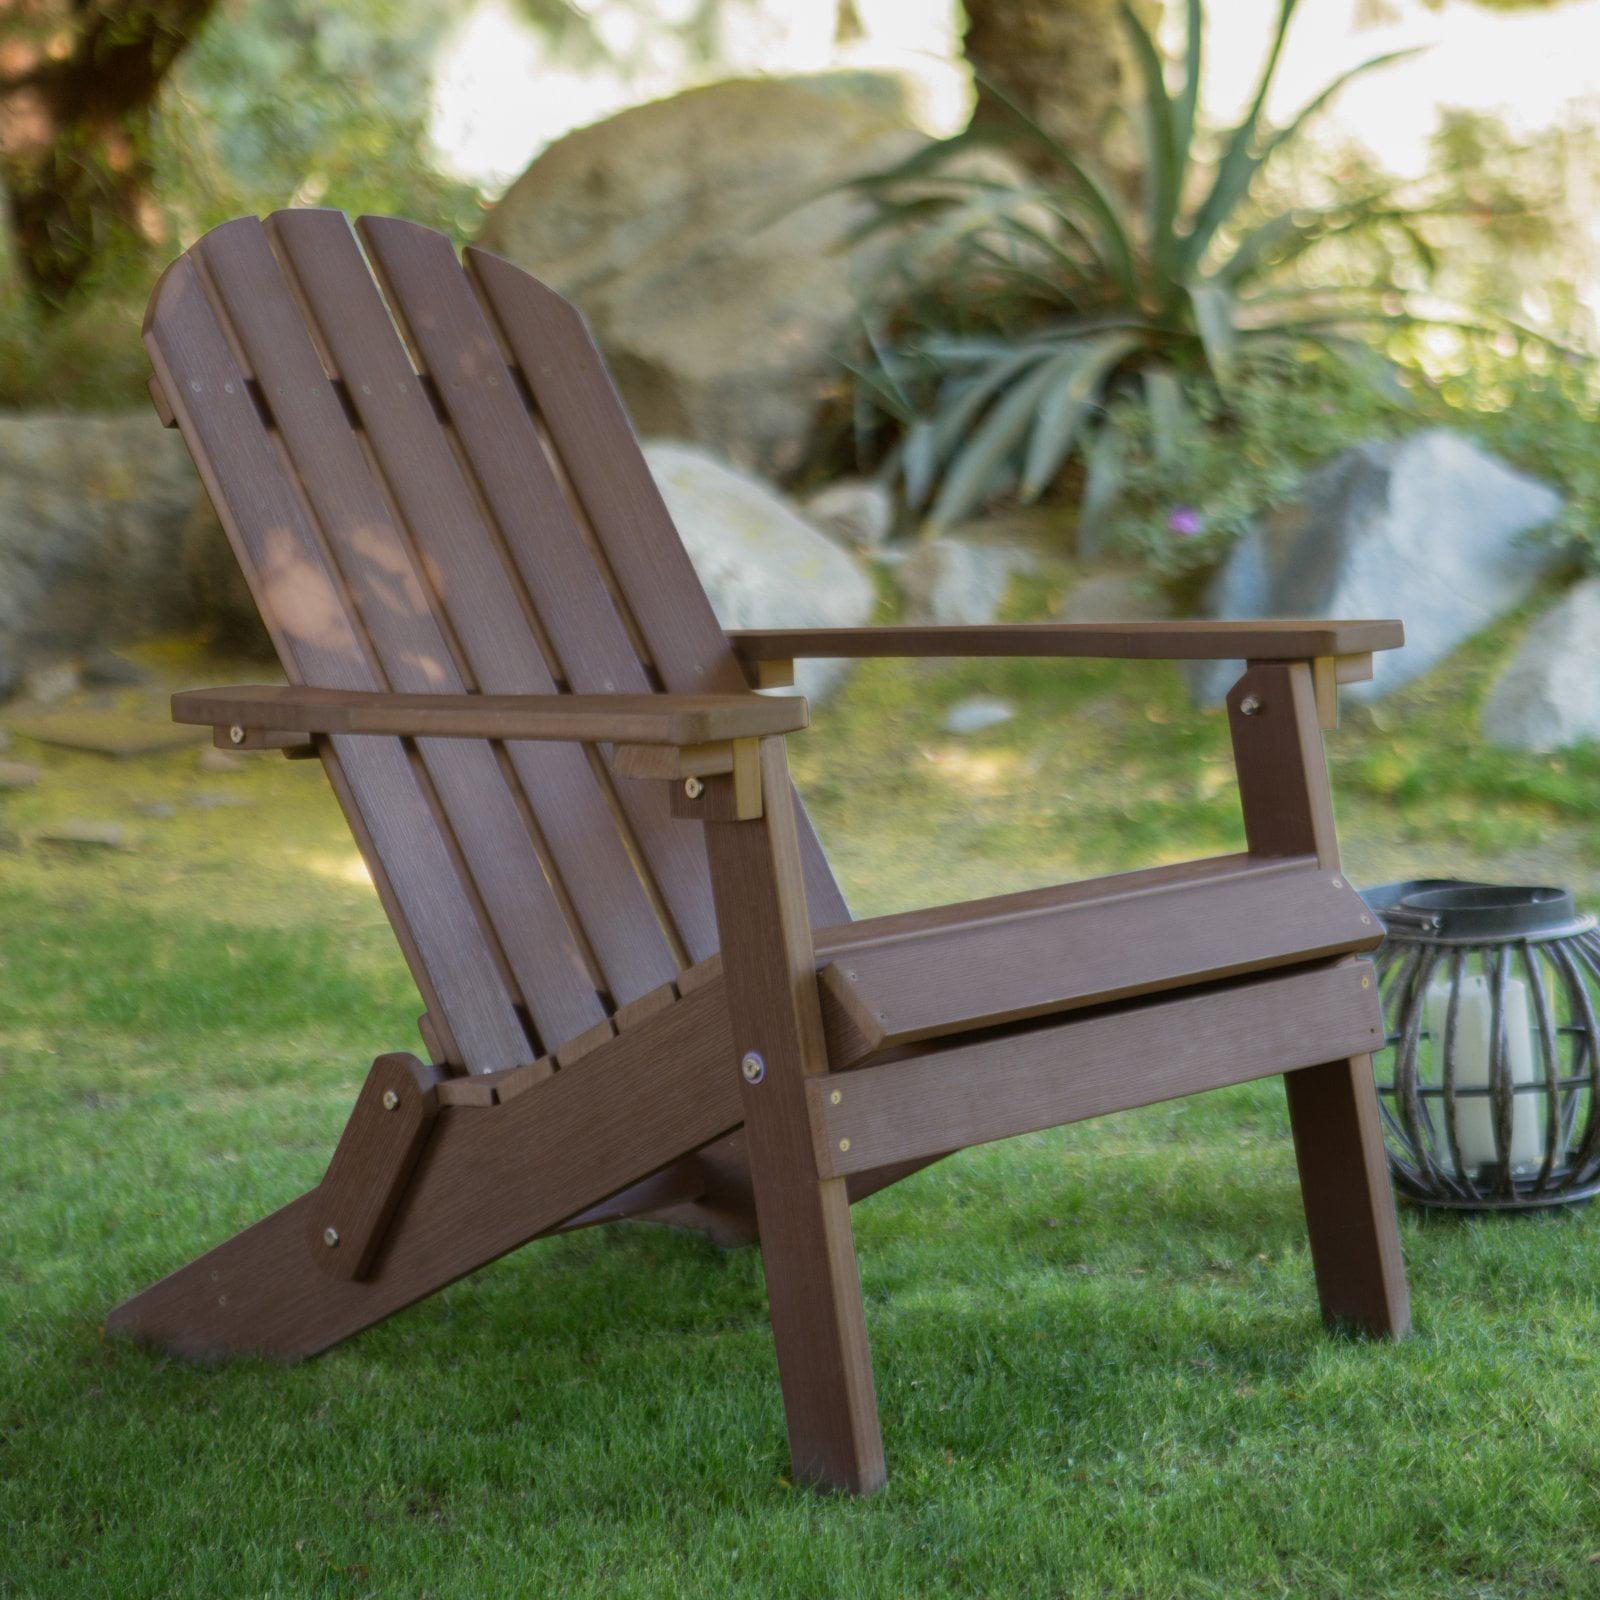 Belham Living All Weather Resin Adirondack Chair - Chocolate Brown